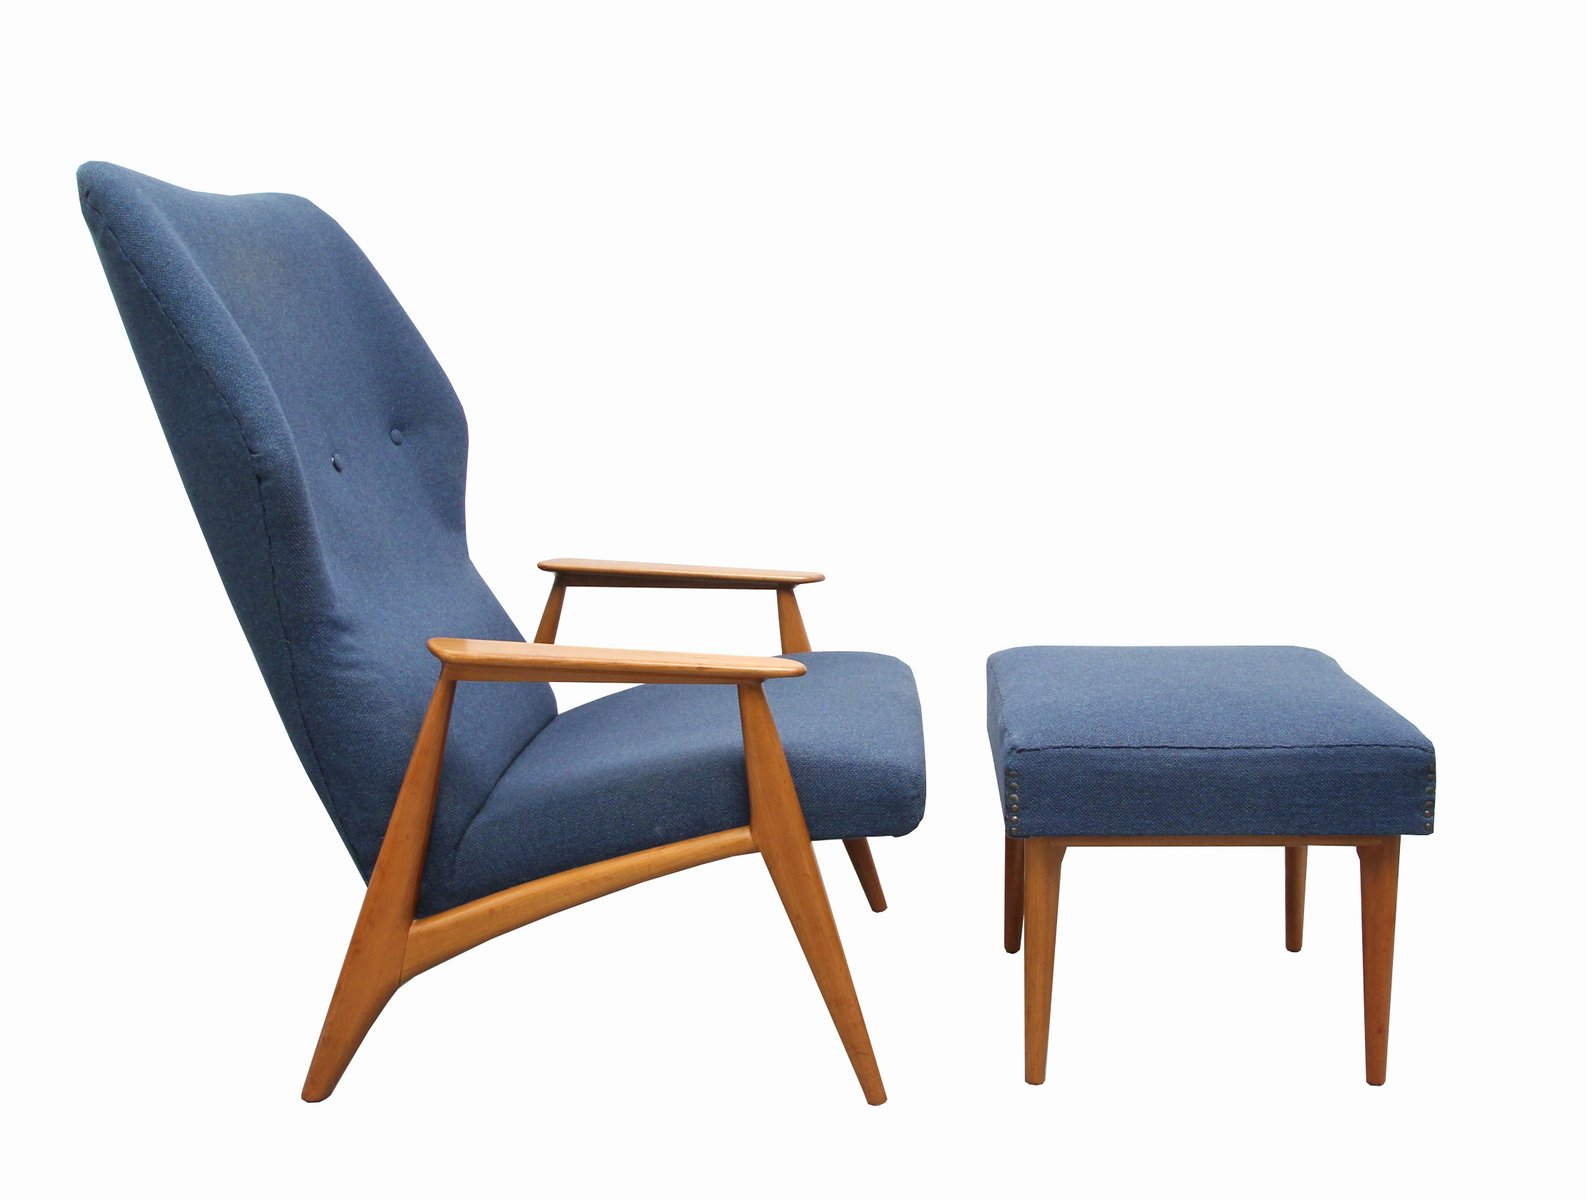 Blue Fabric U0026 Cherry Armchair With Ottoman, 1960s